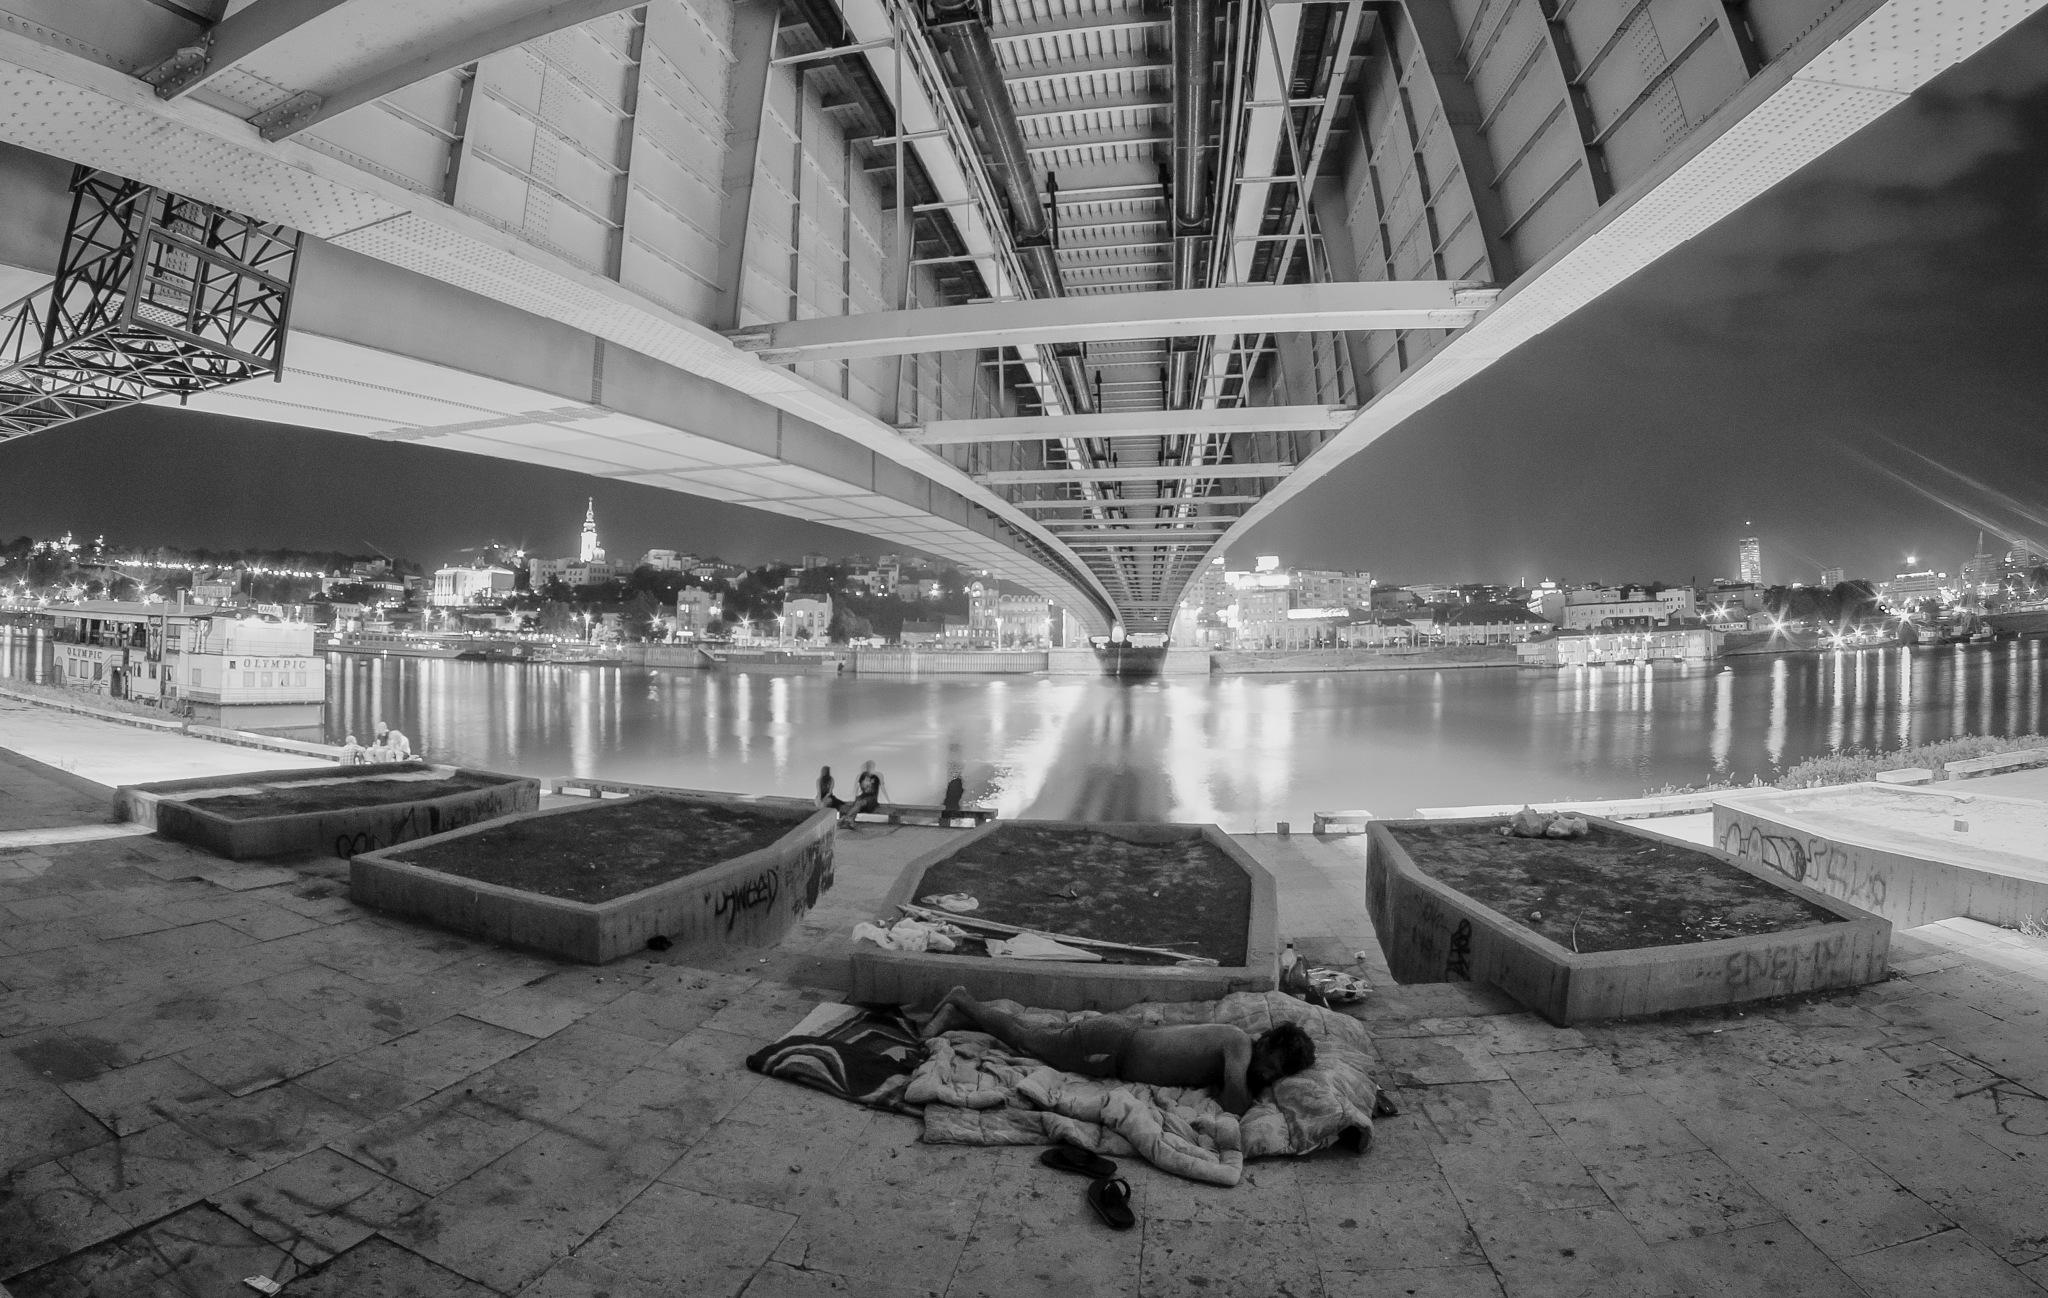 under the bridge by nikolov